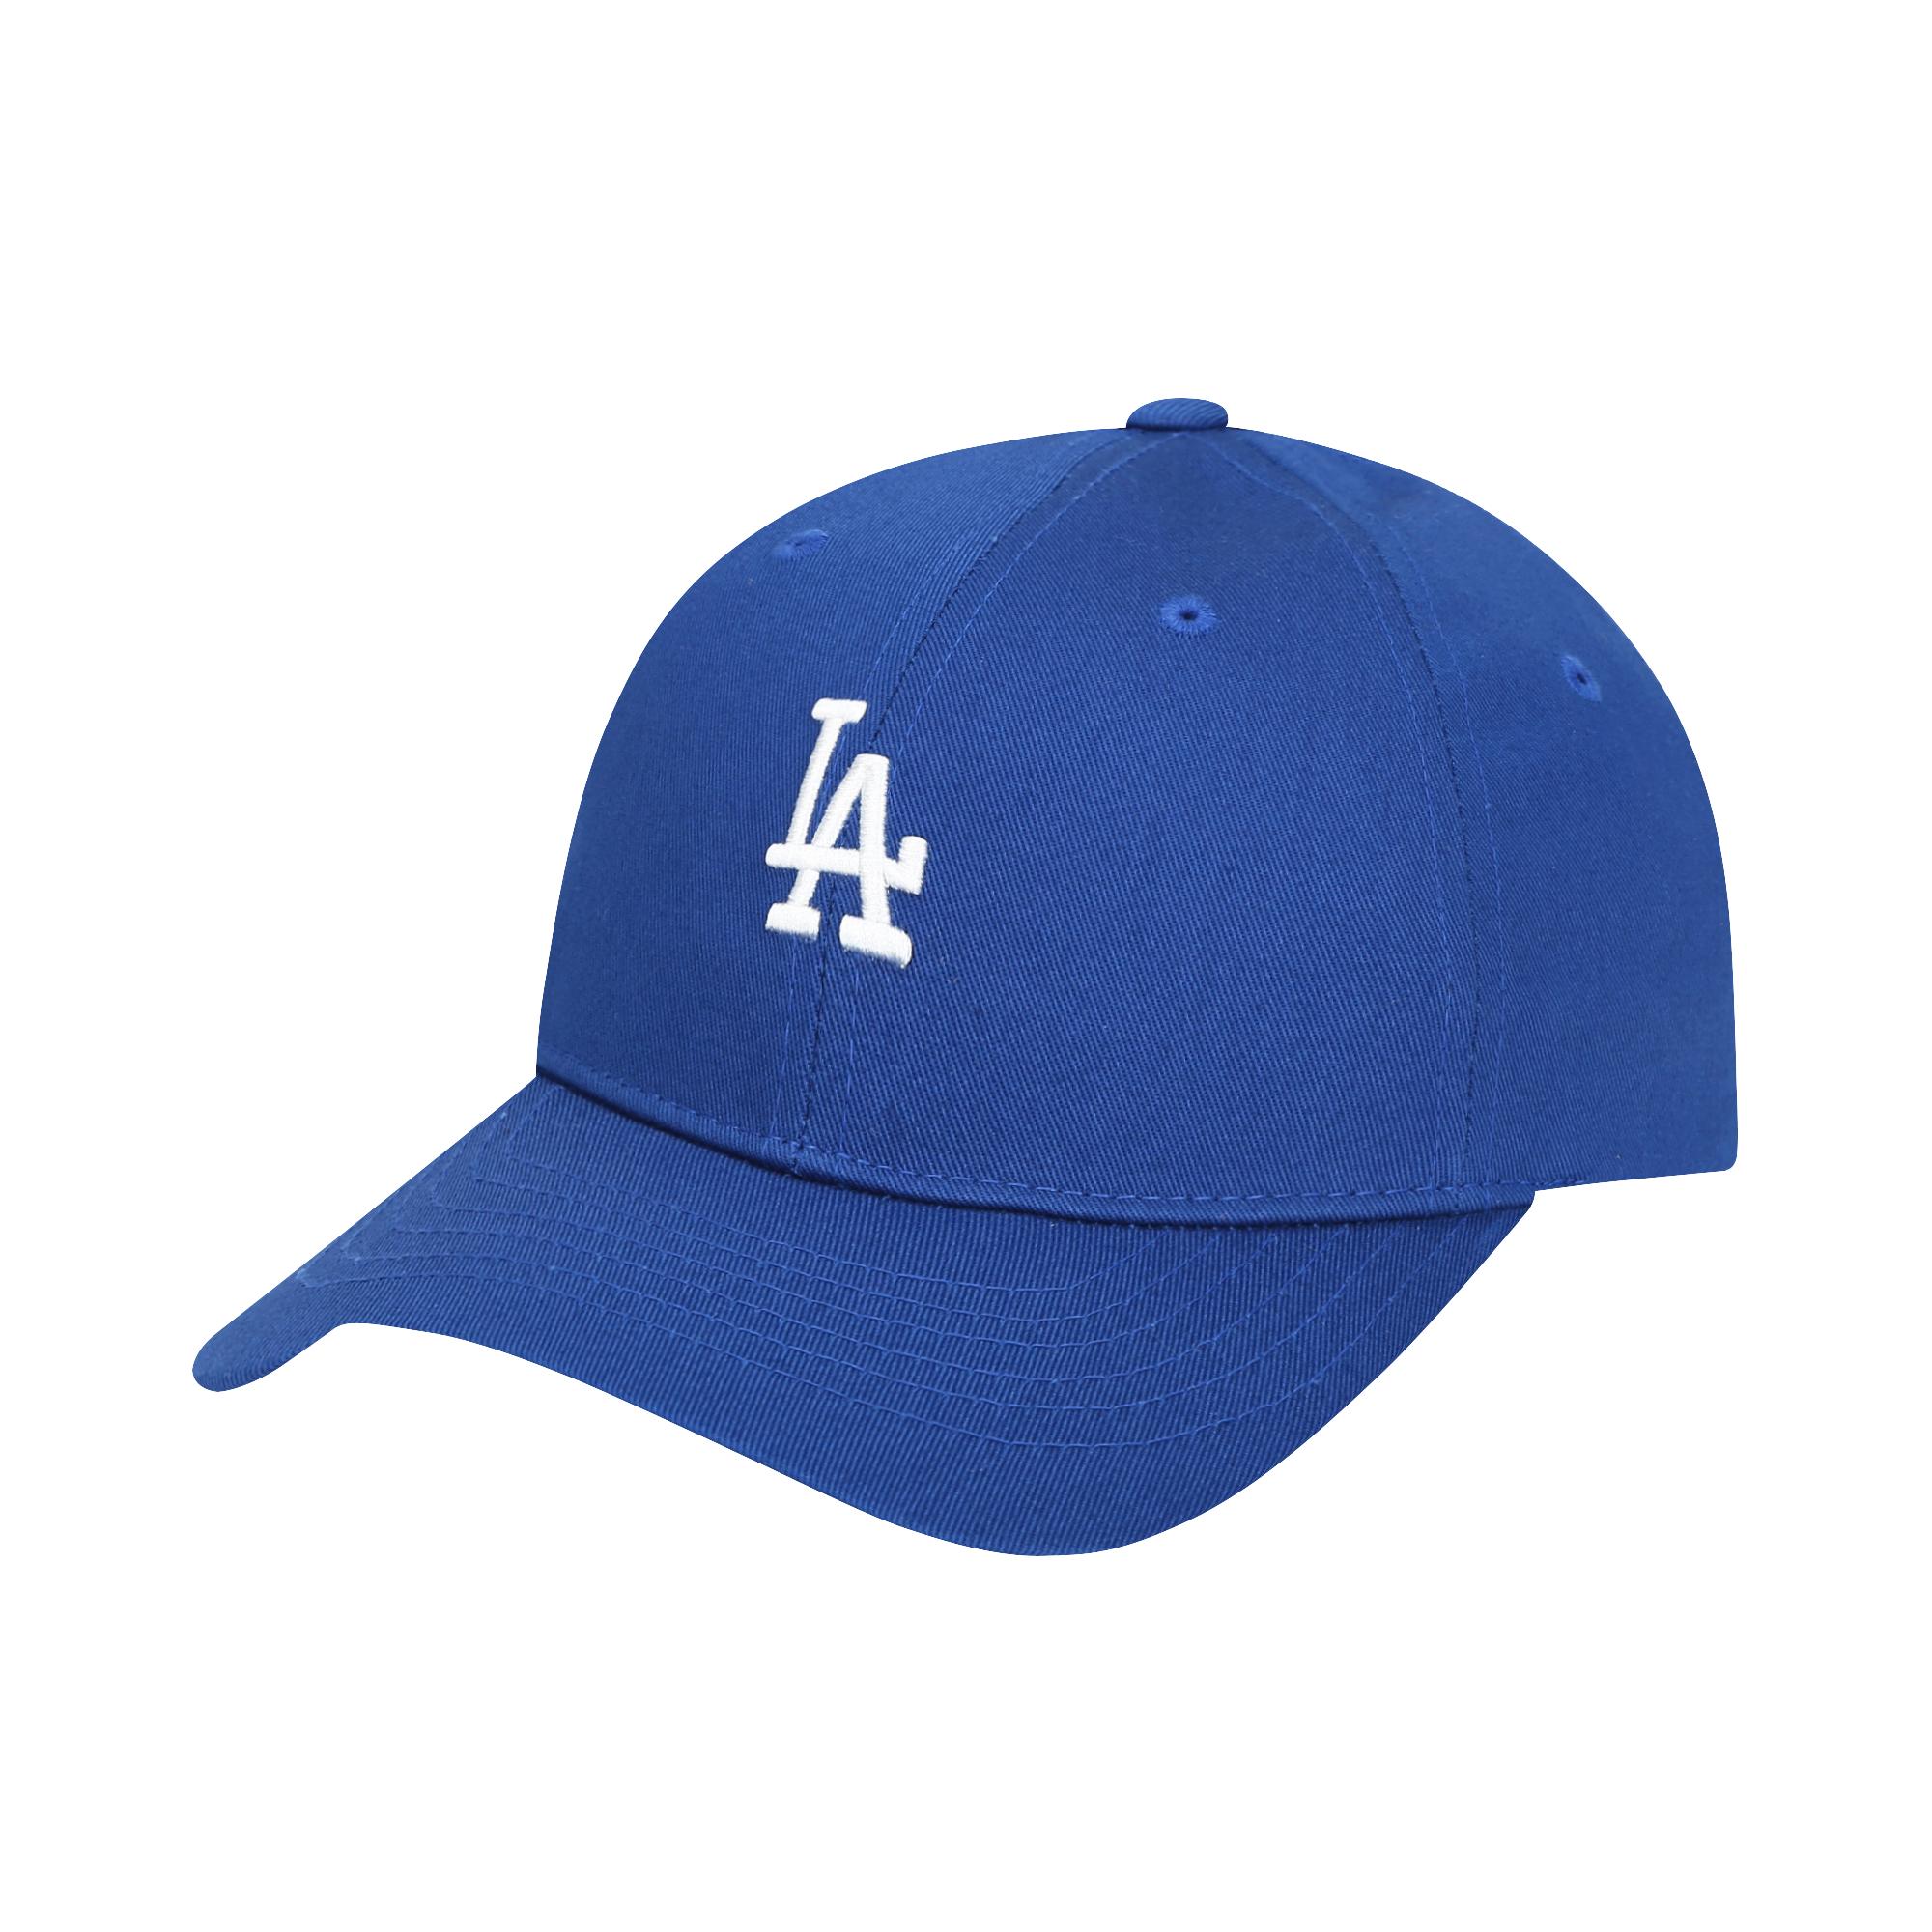 LA DODGERS LUCKY BALL CAP